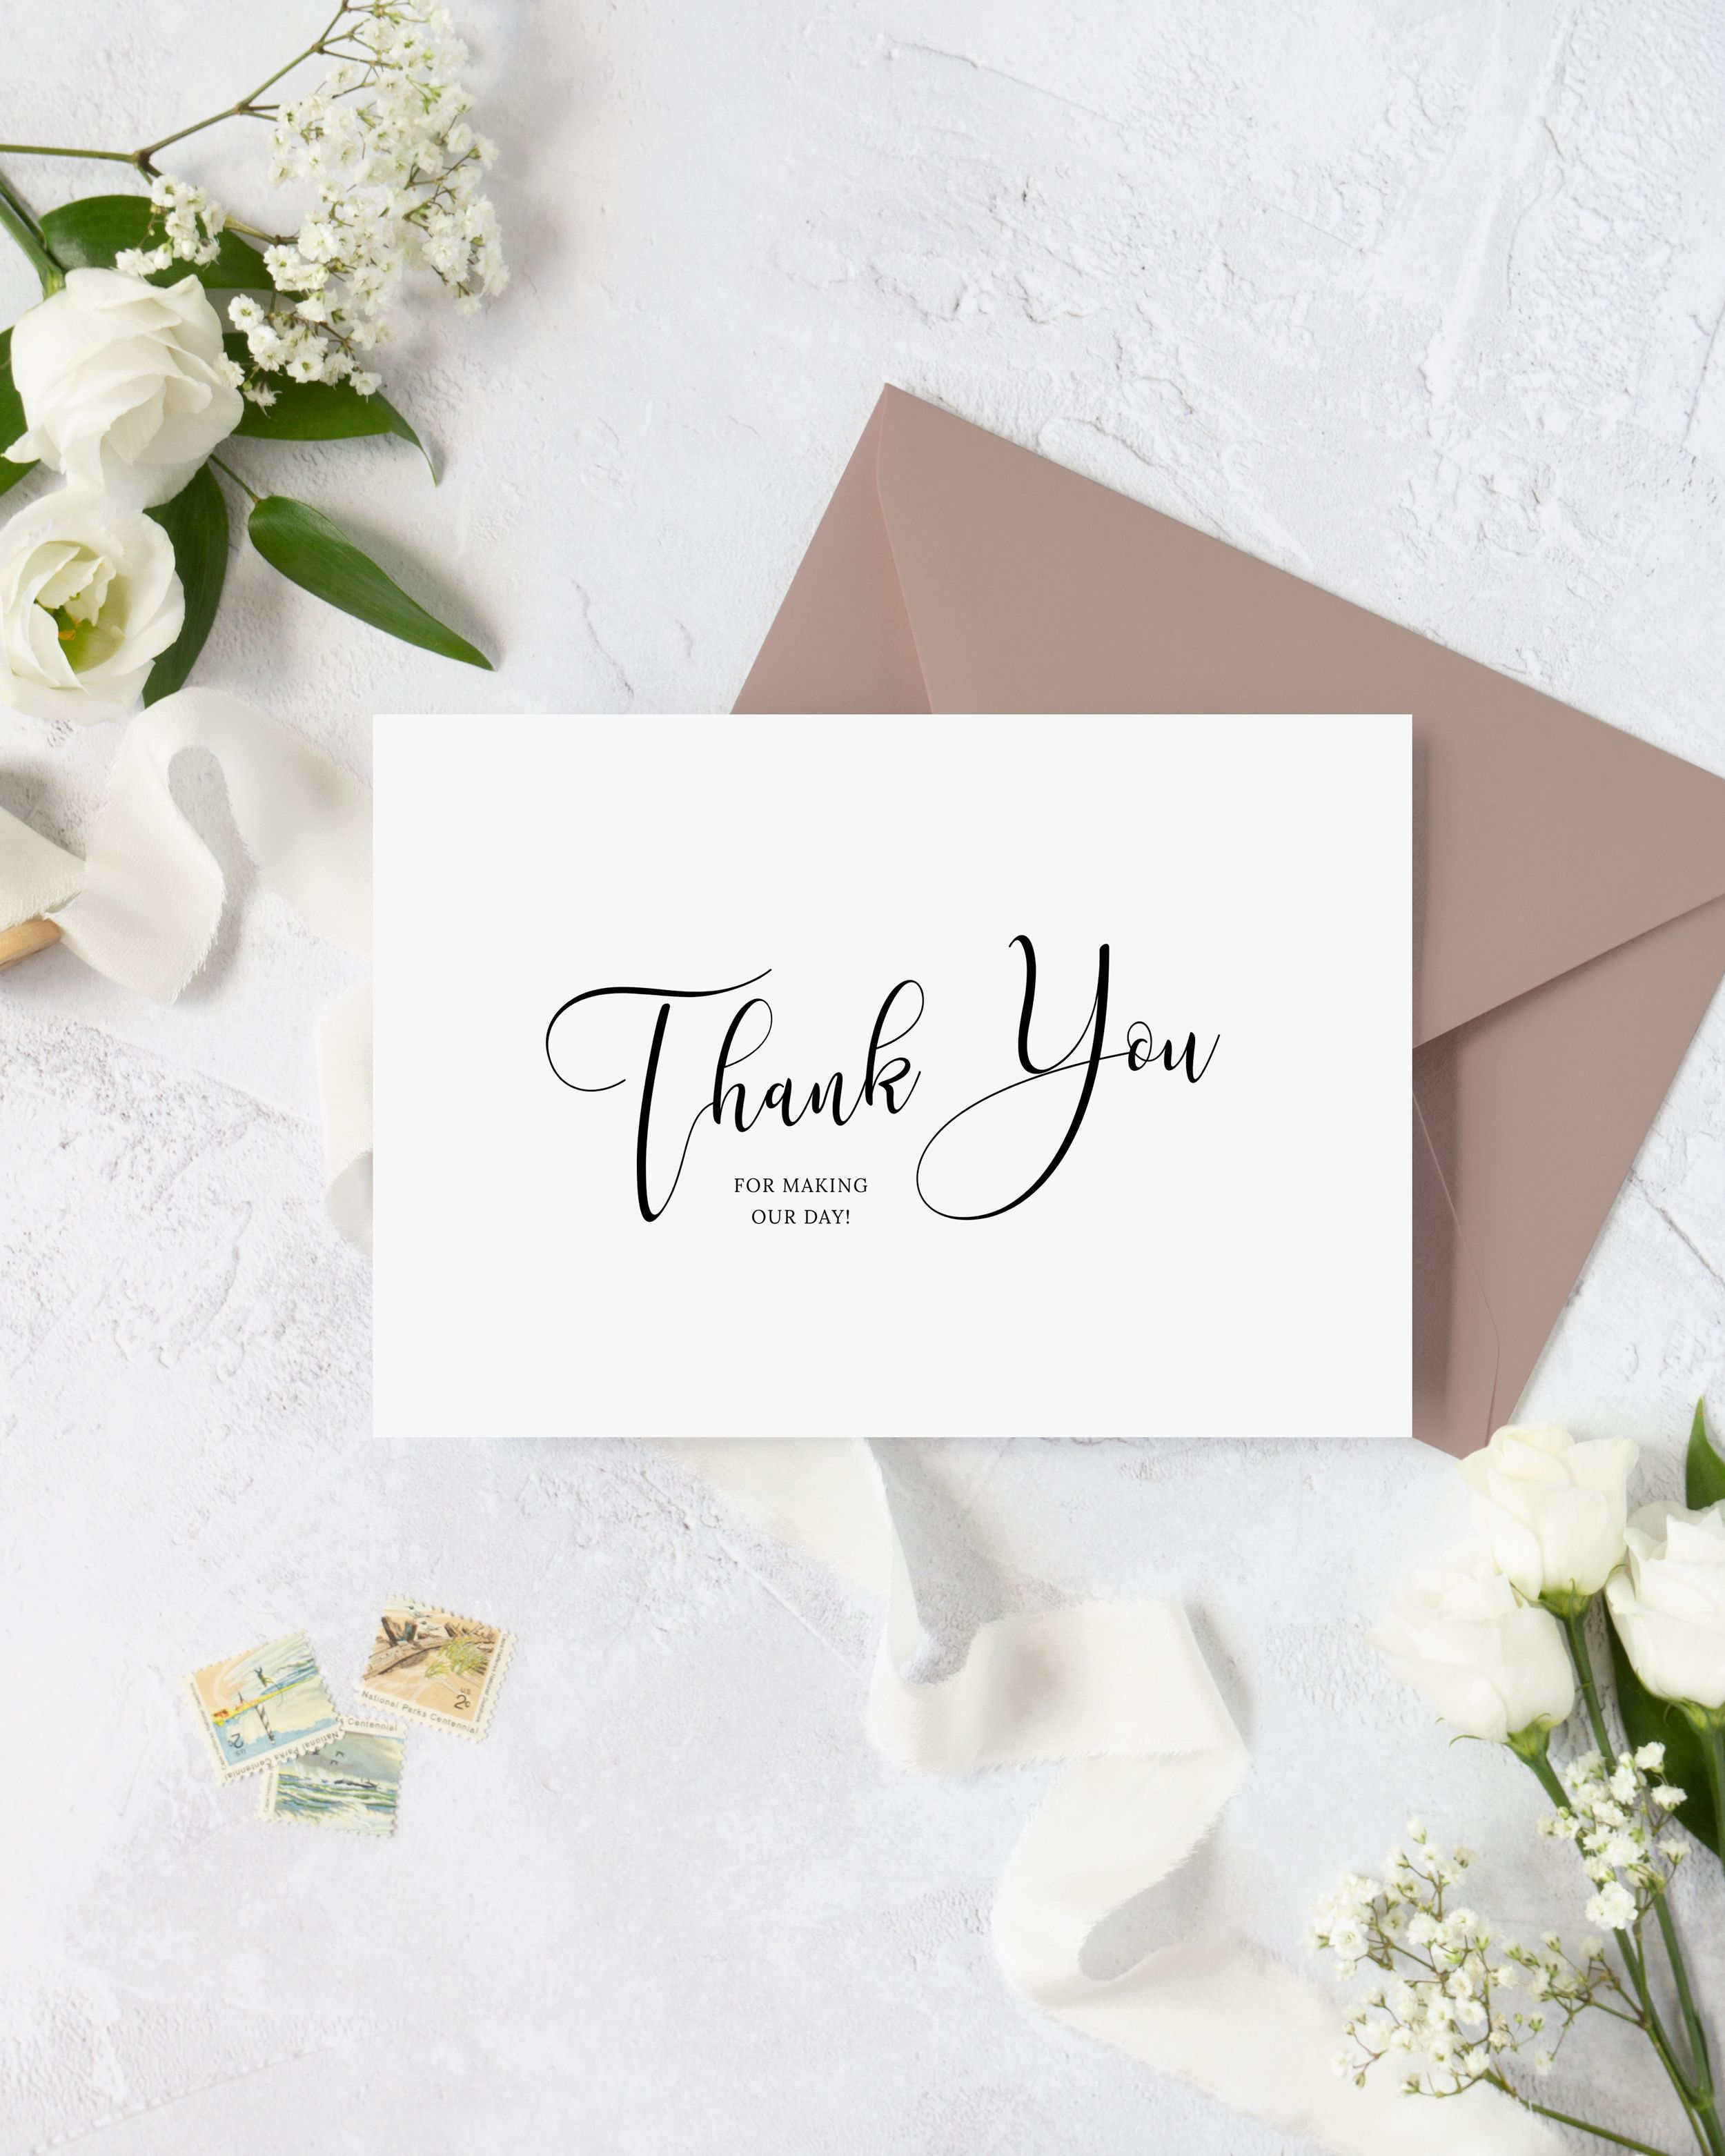 001 Singular Diy Wedding Thank You Card Template Inspiration  TemplatesFull